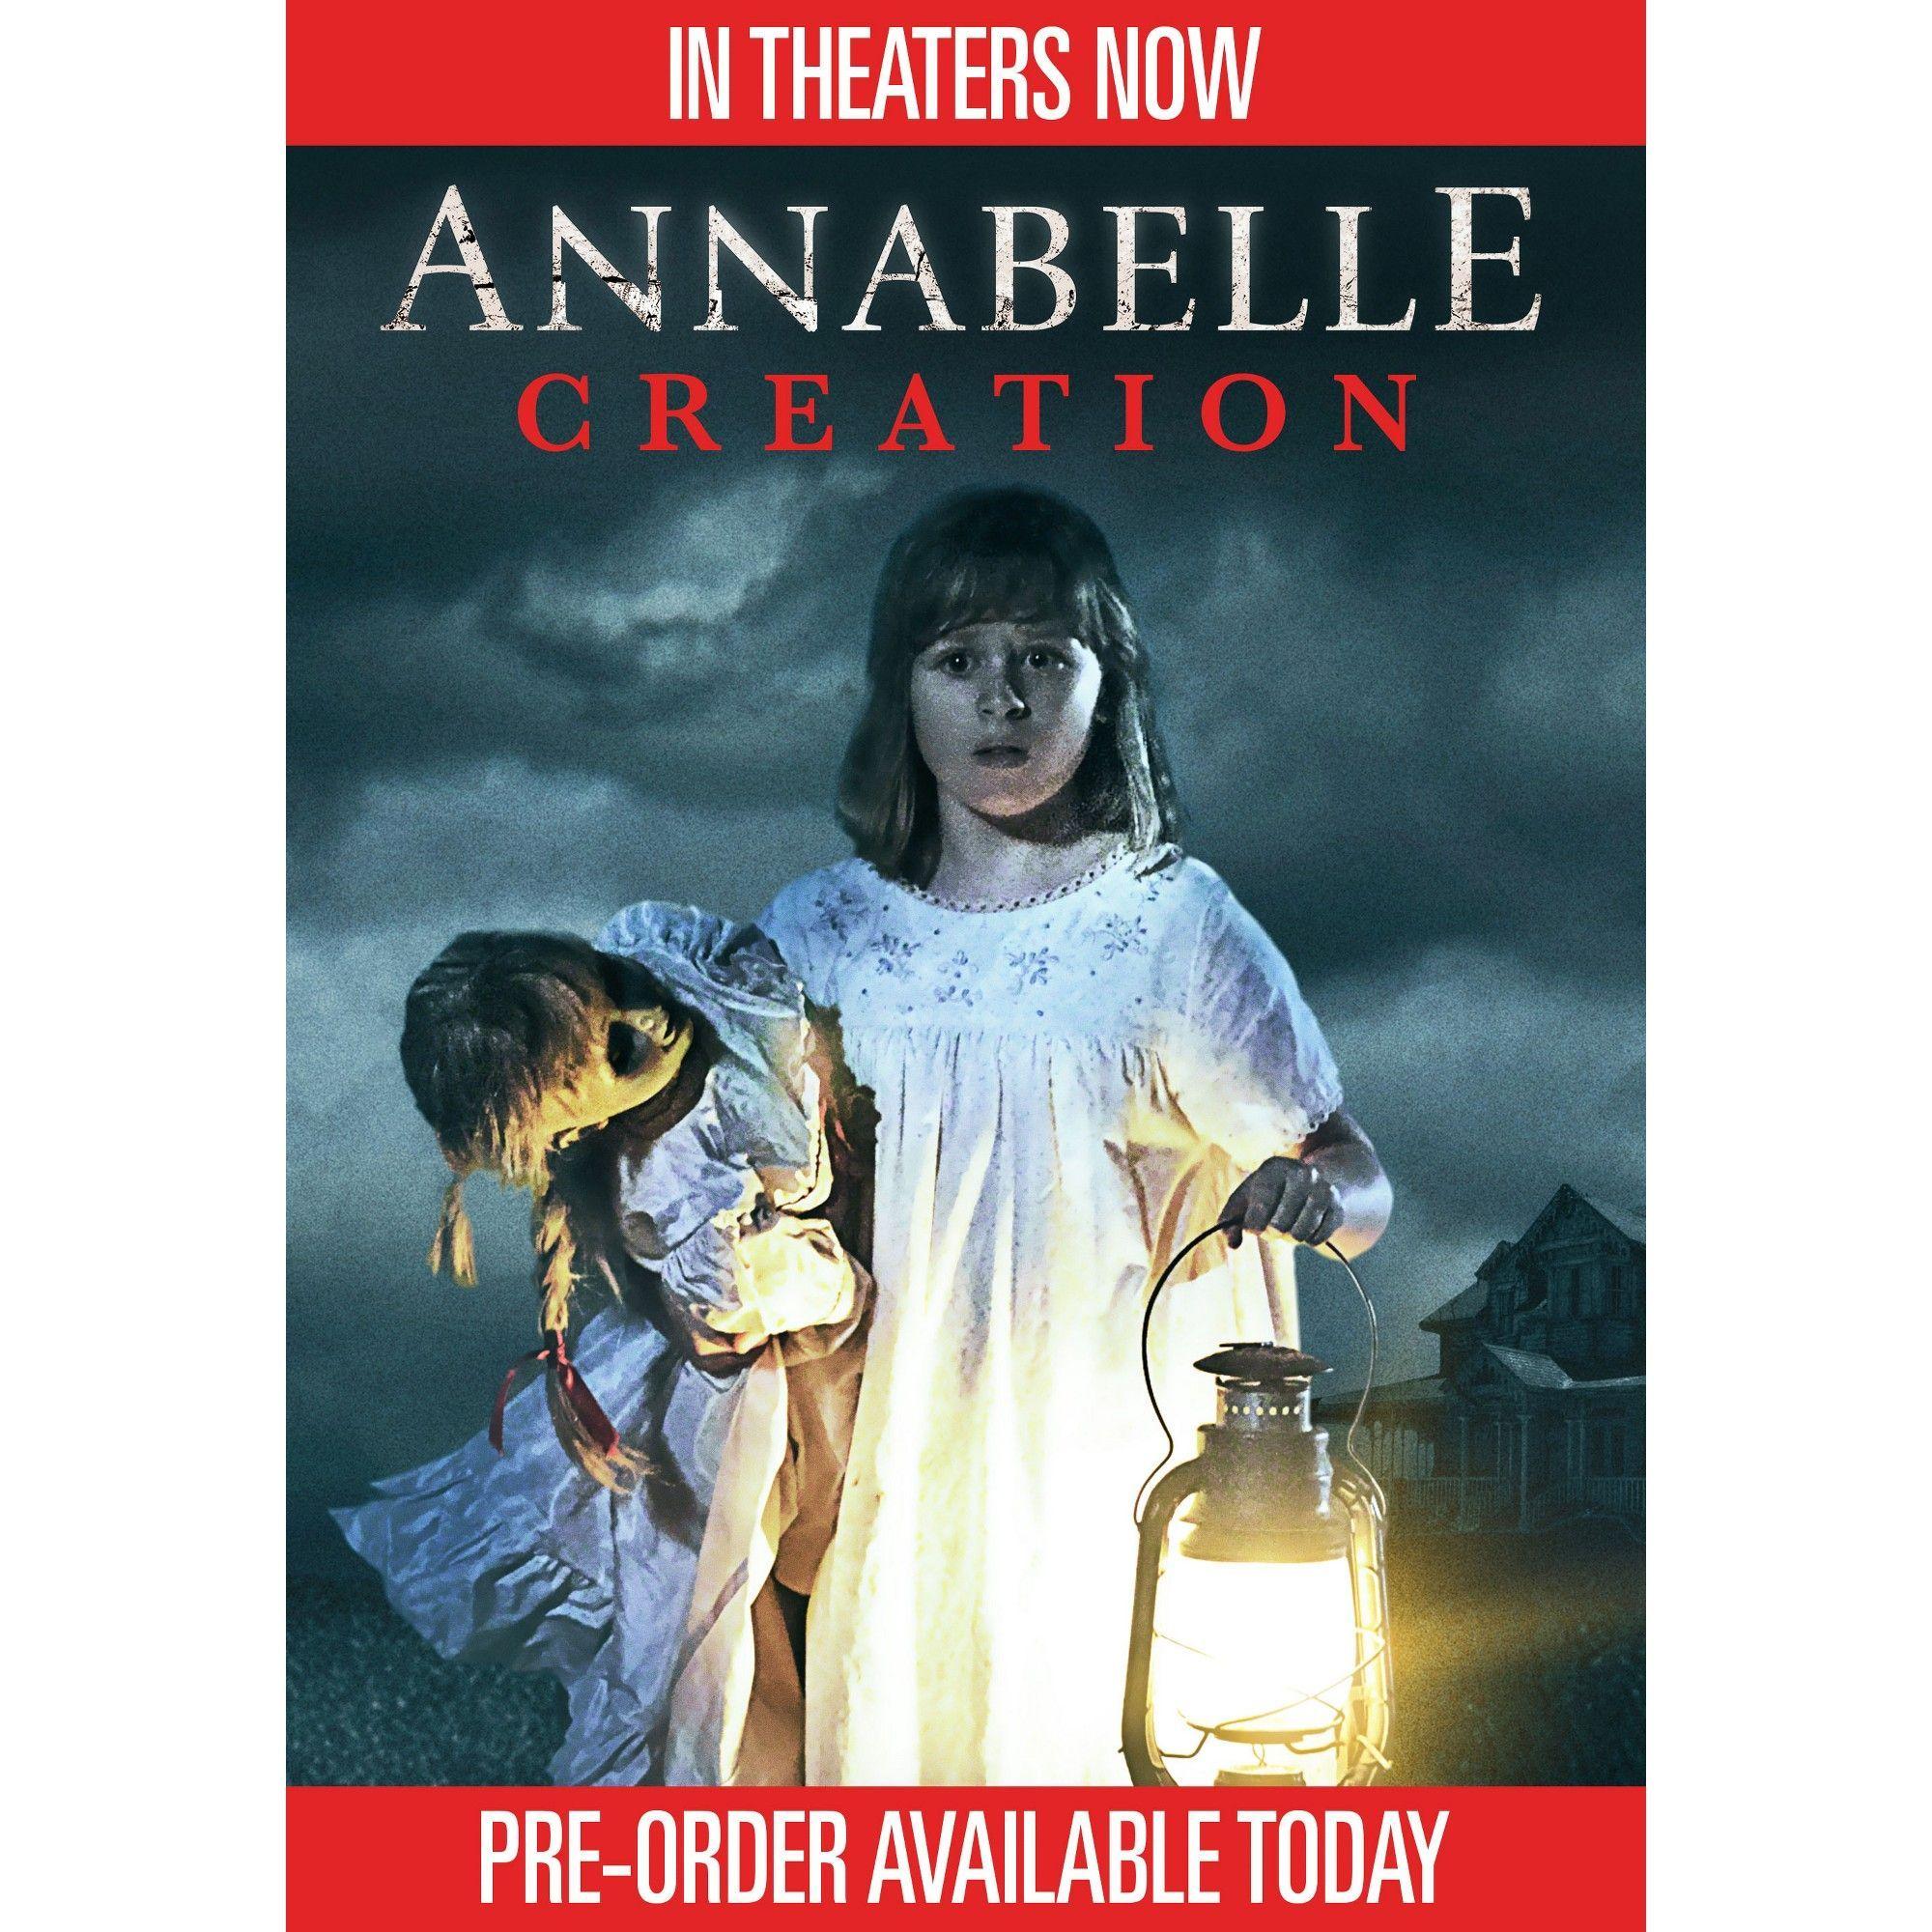 Annabelle Creation (Blu-ray + Dvd + Digital)